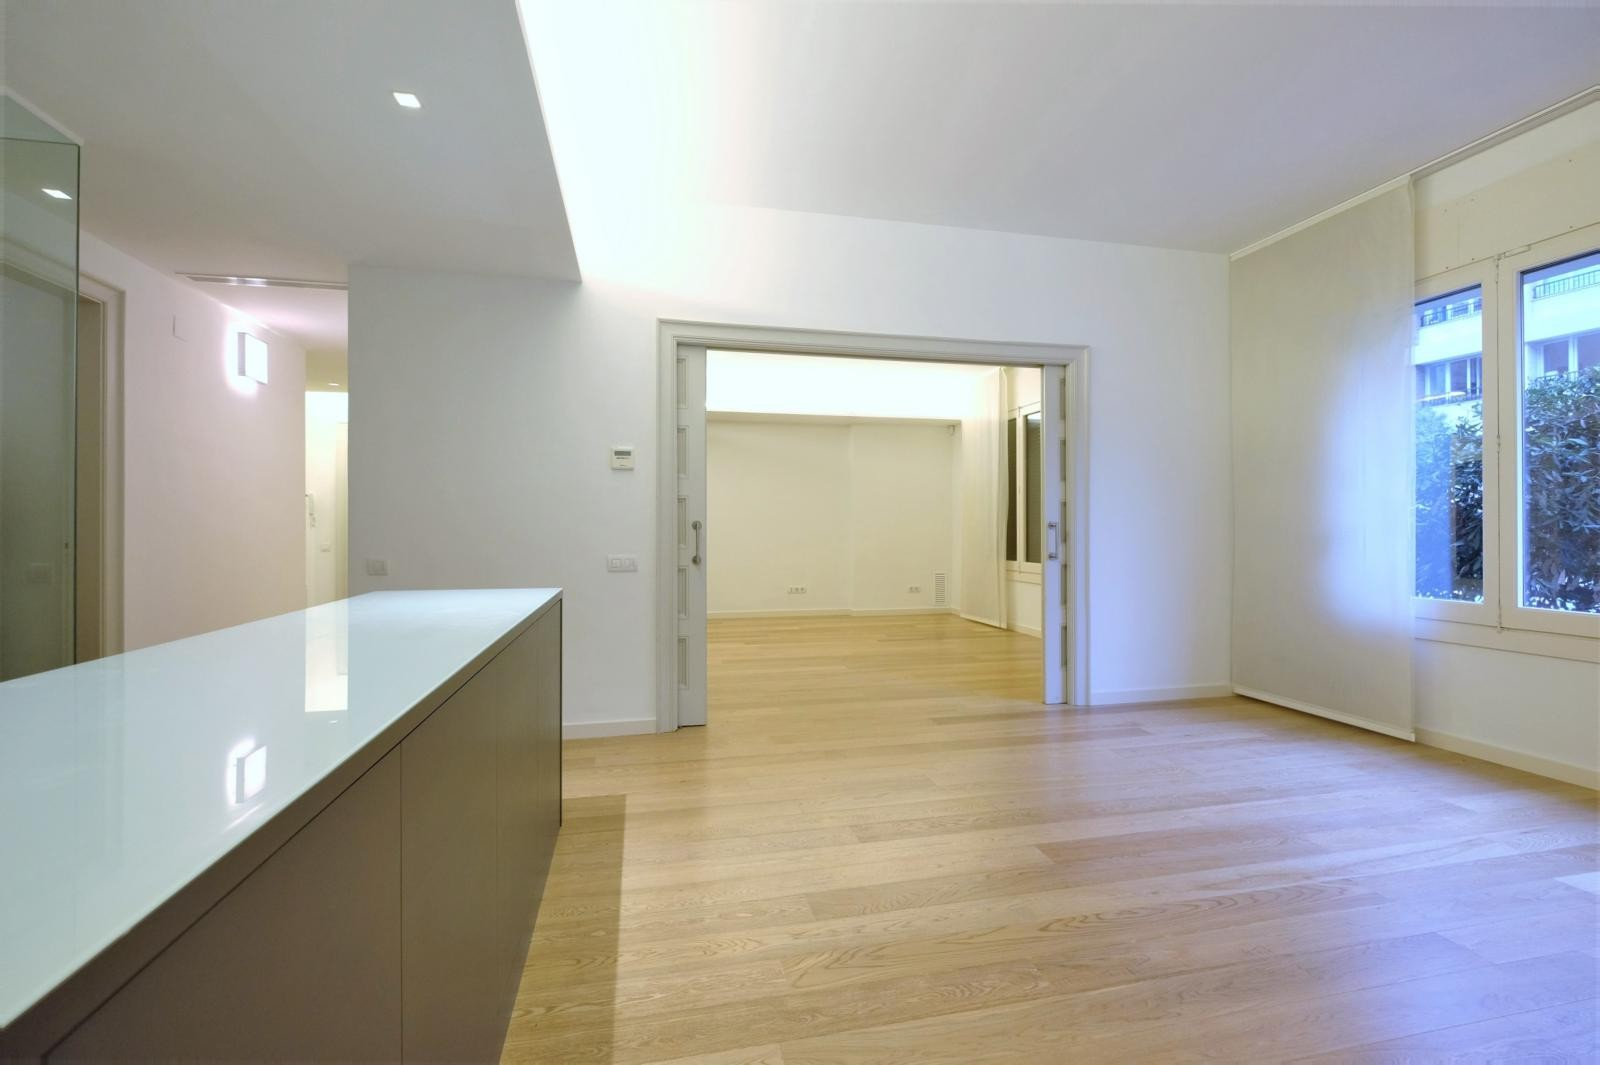 MG Inmobiliaria Barcelona - reina-victoria-jto-turo-park-1318